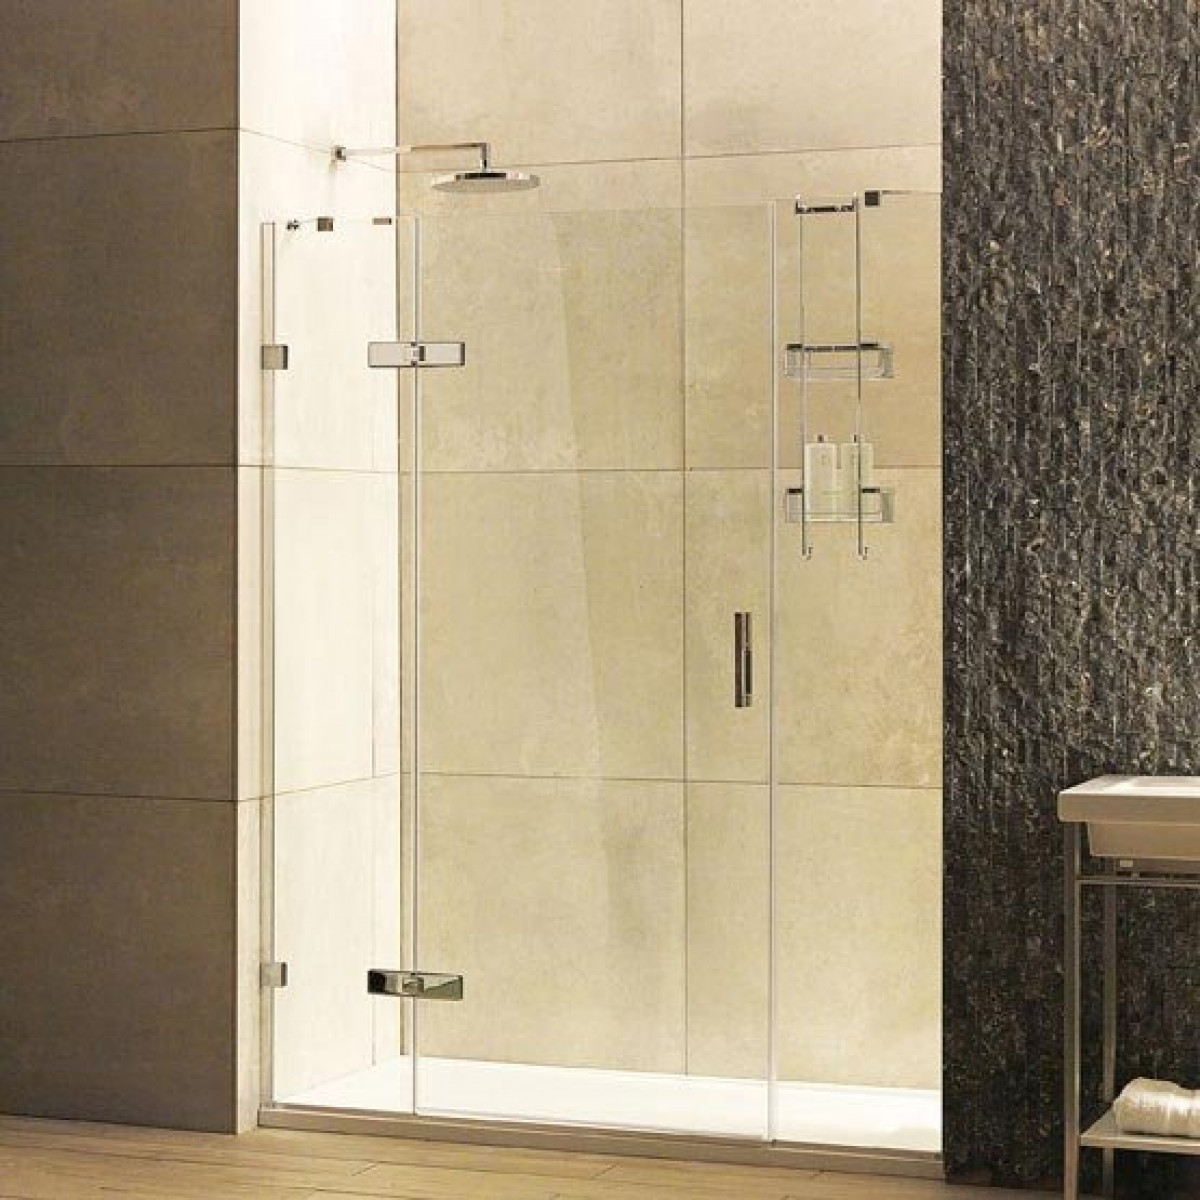 Roman Liberty Inward Or Outward Opening Hinged Shower Door